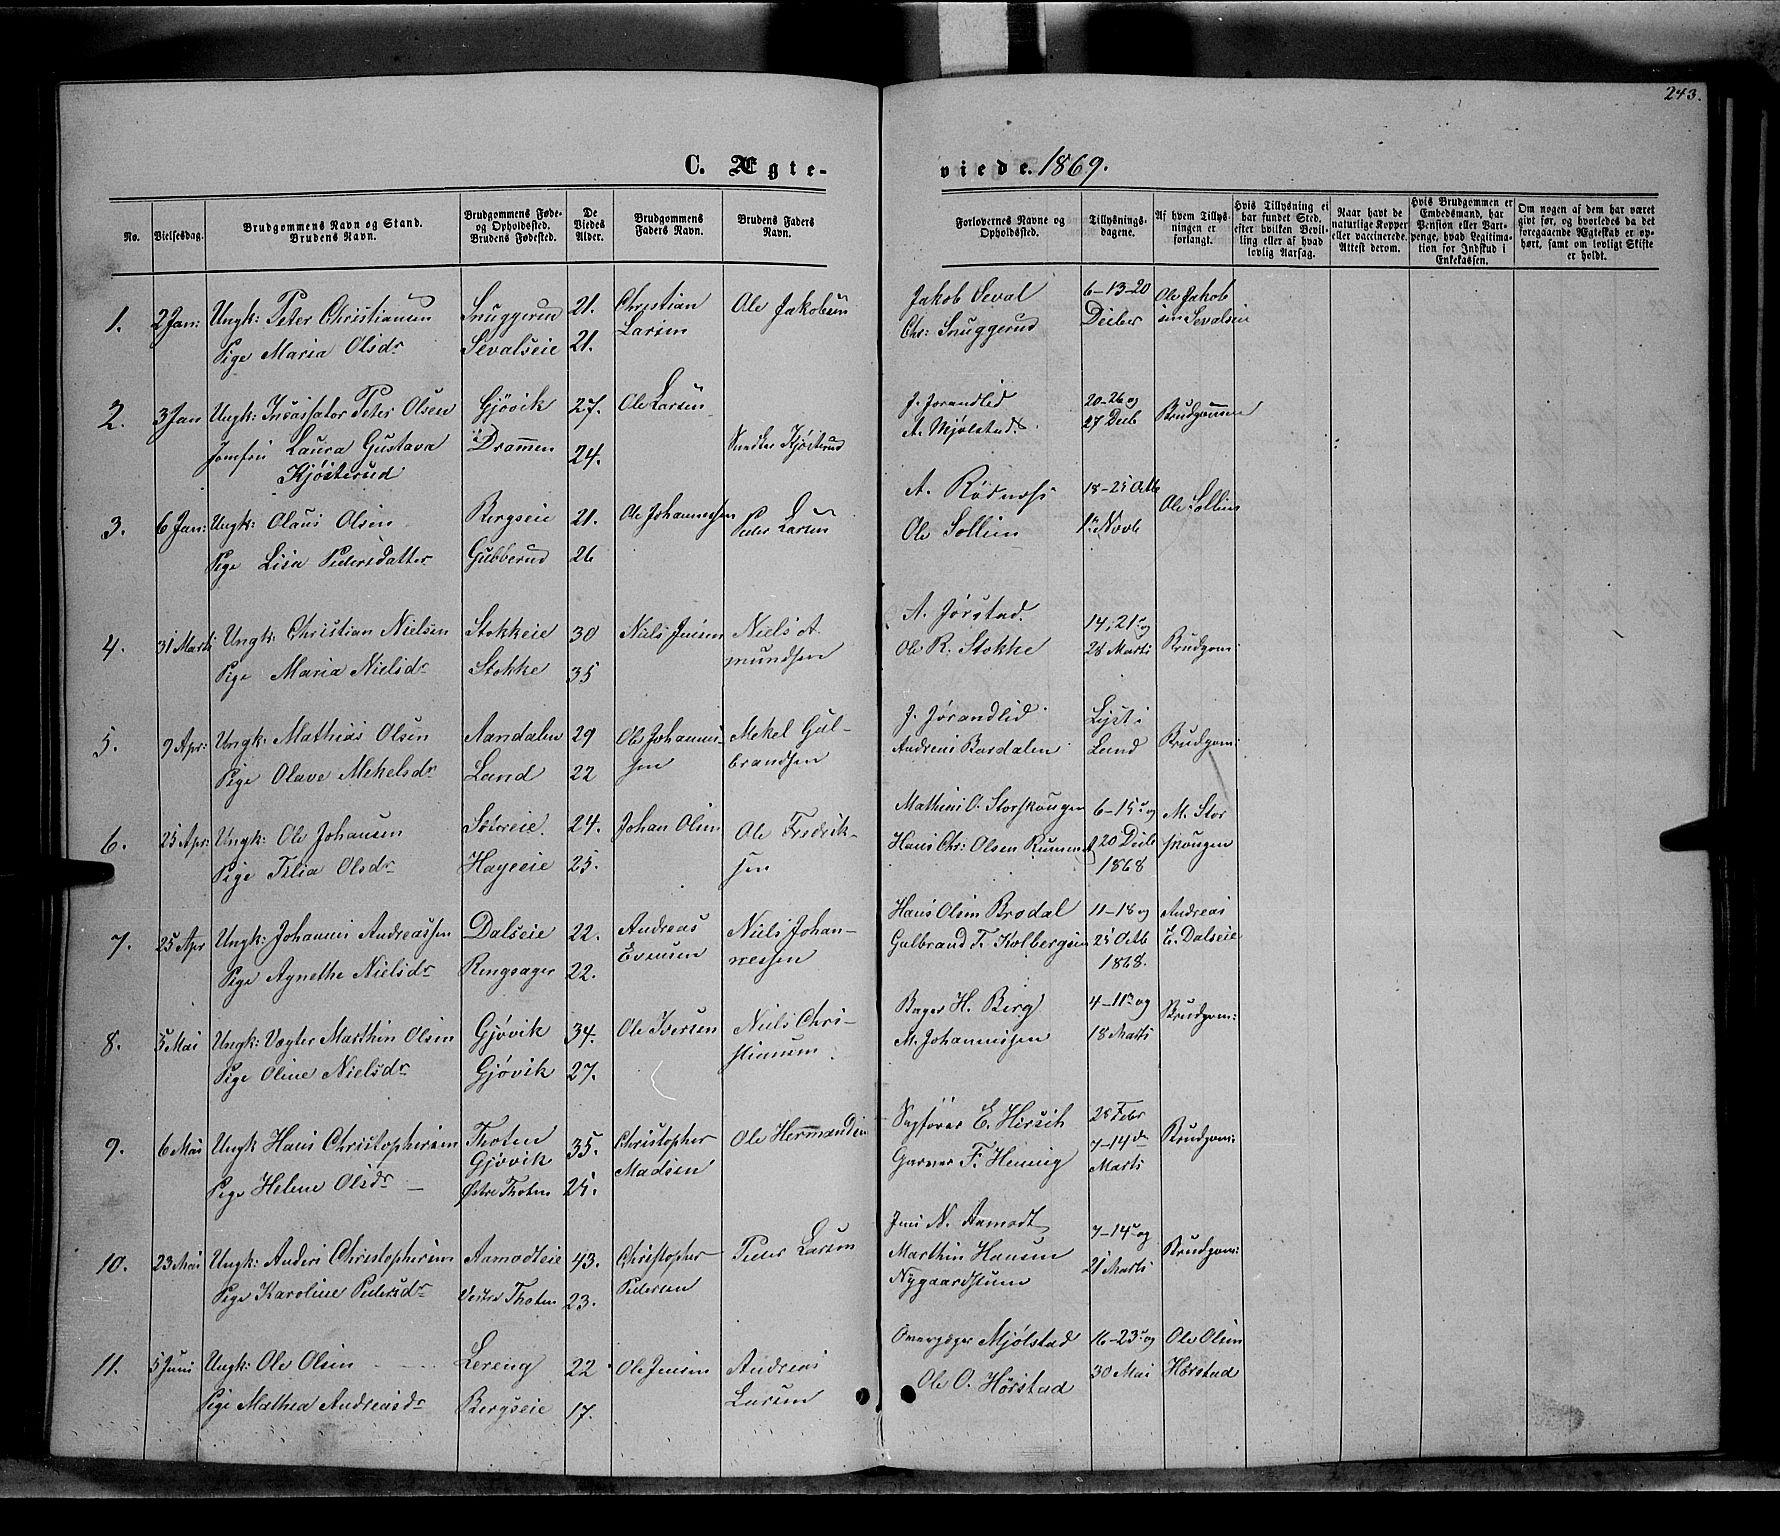 SAH, Vardal prestekontor, H/Ha/Hab/L0006: Klokkerbok nr. 6, 1869-1881, s. 243